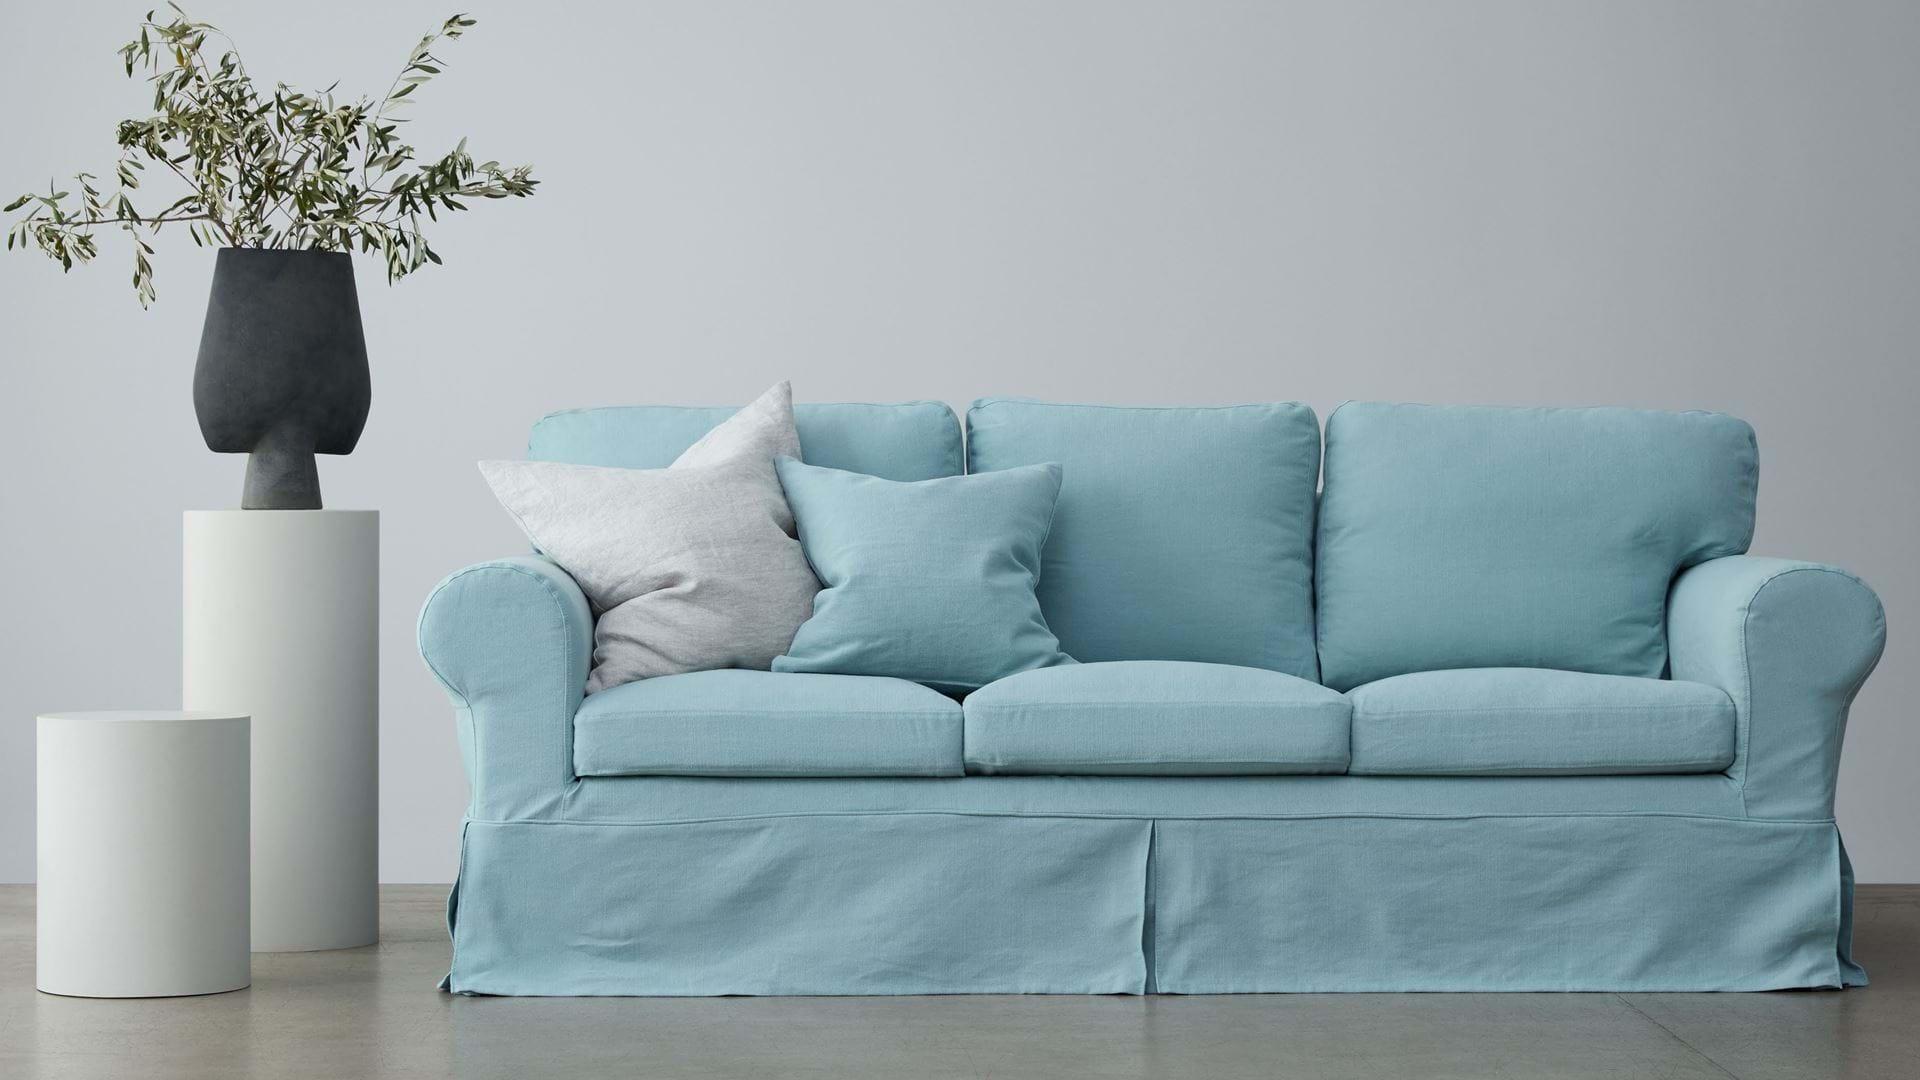 Ikea Ektorp 3 Seater Sofa Cover Loose Fit Bemz